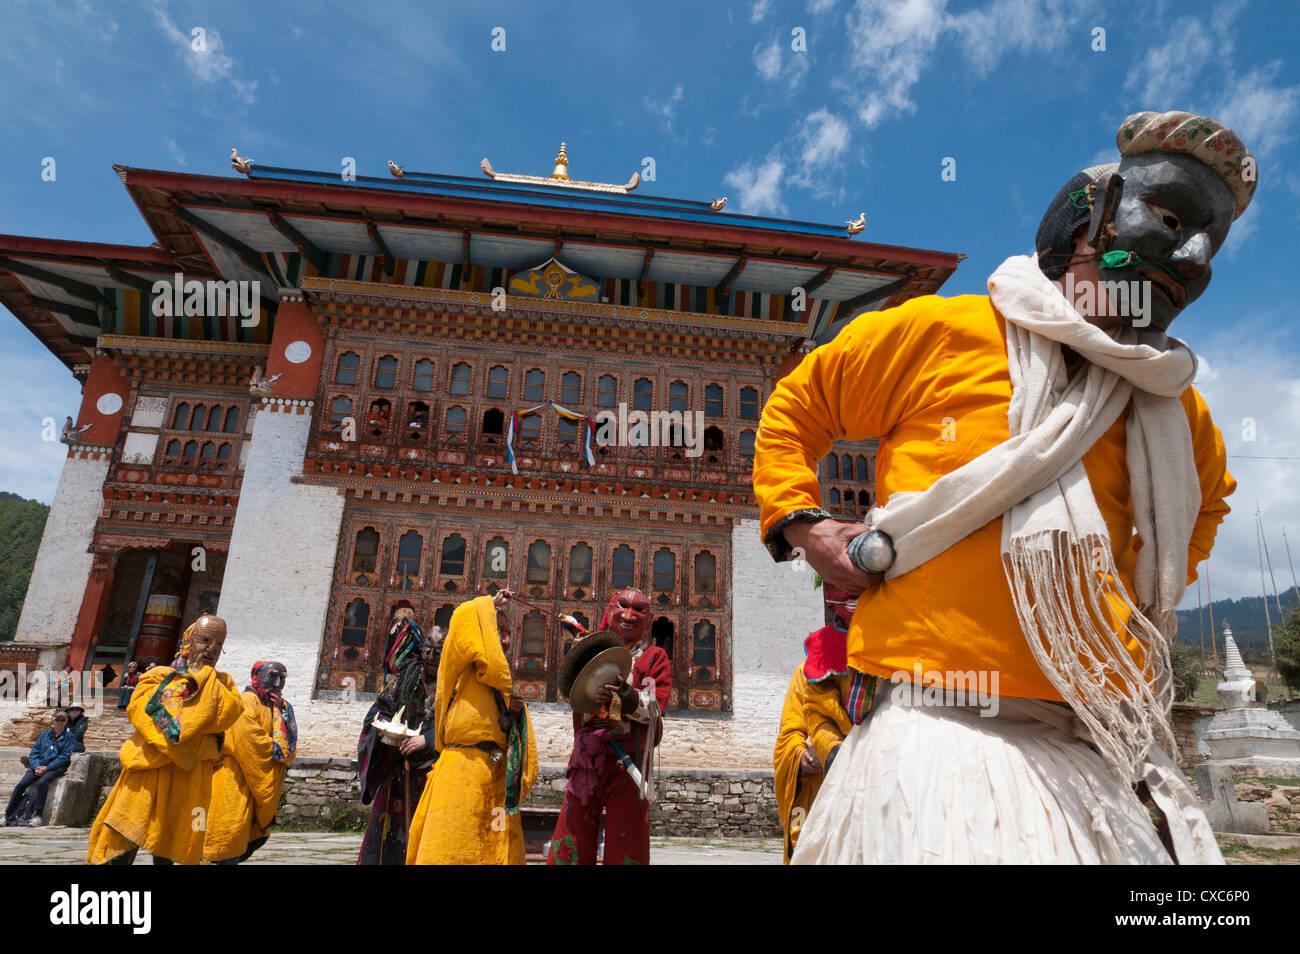 Festival budista tradicional en el URA, Bumthang, Bhután, Asia Imagen De Stock